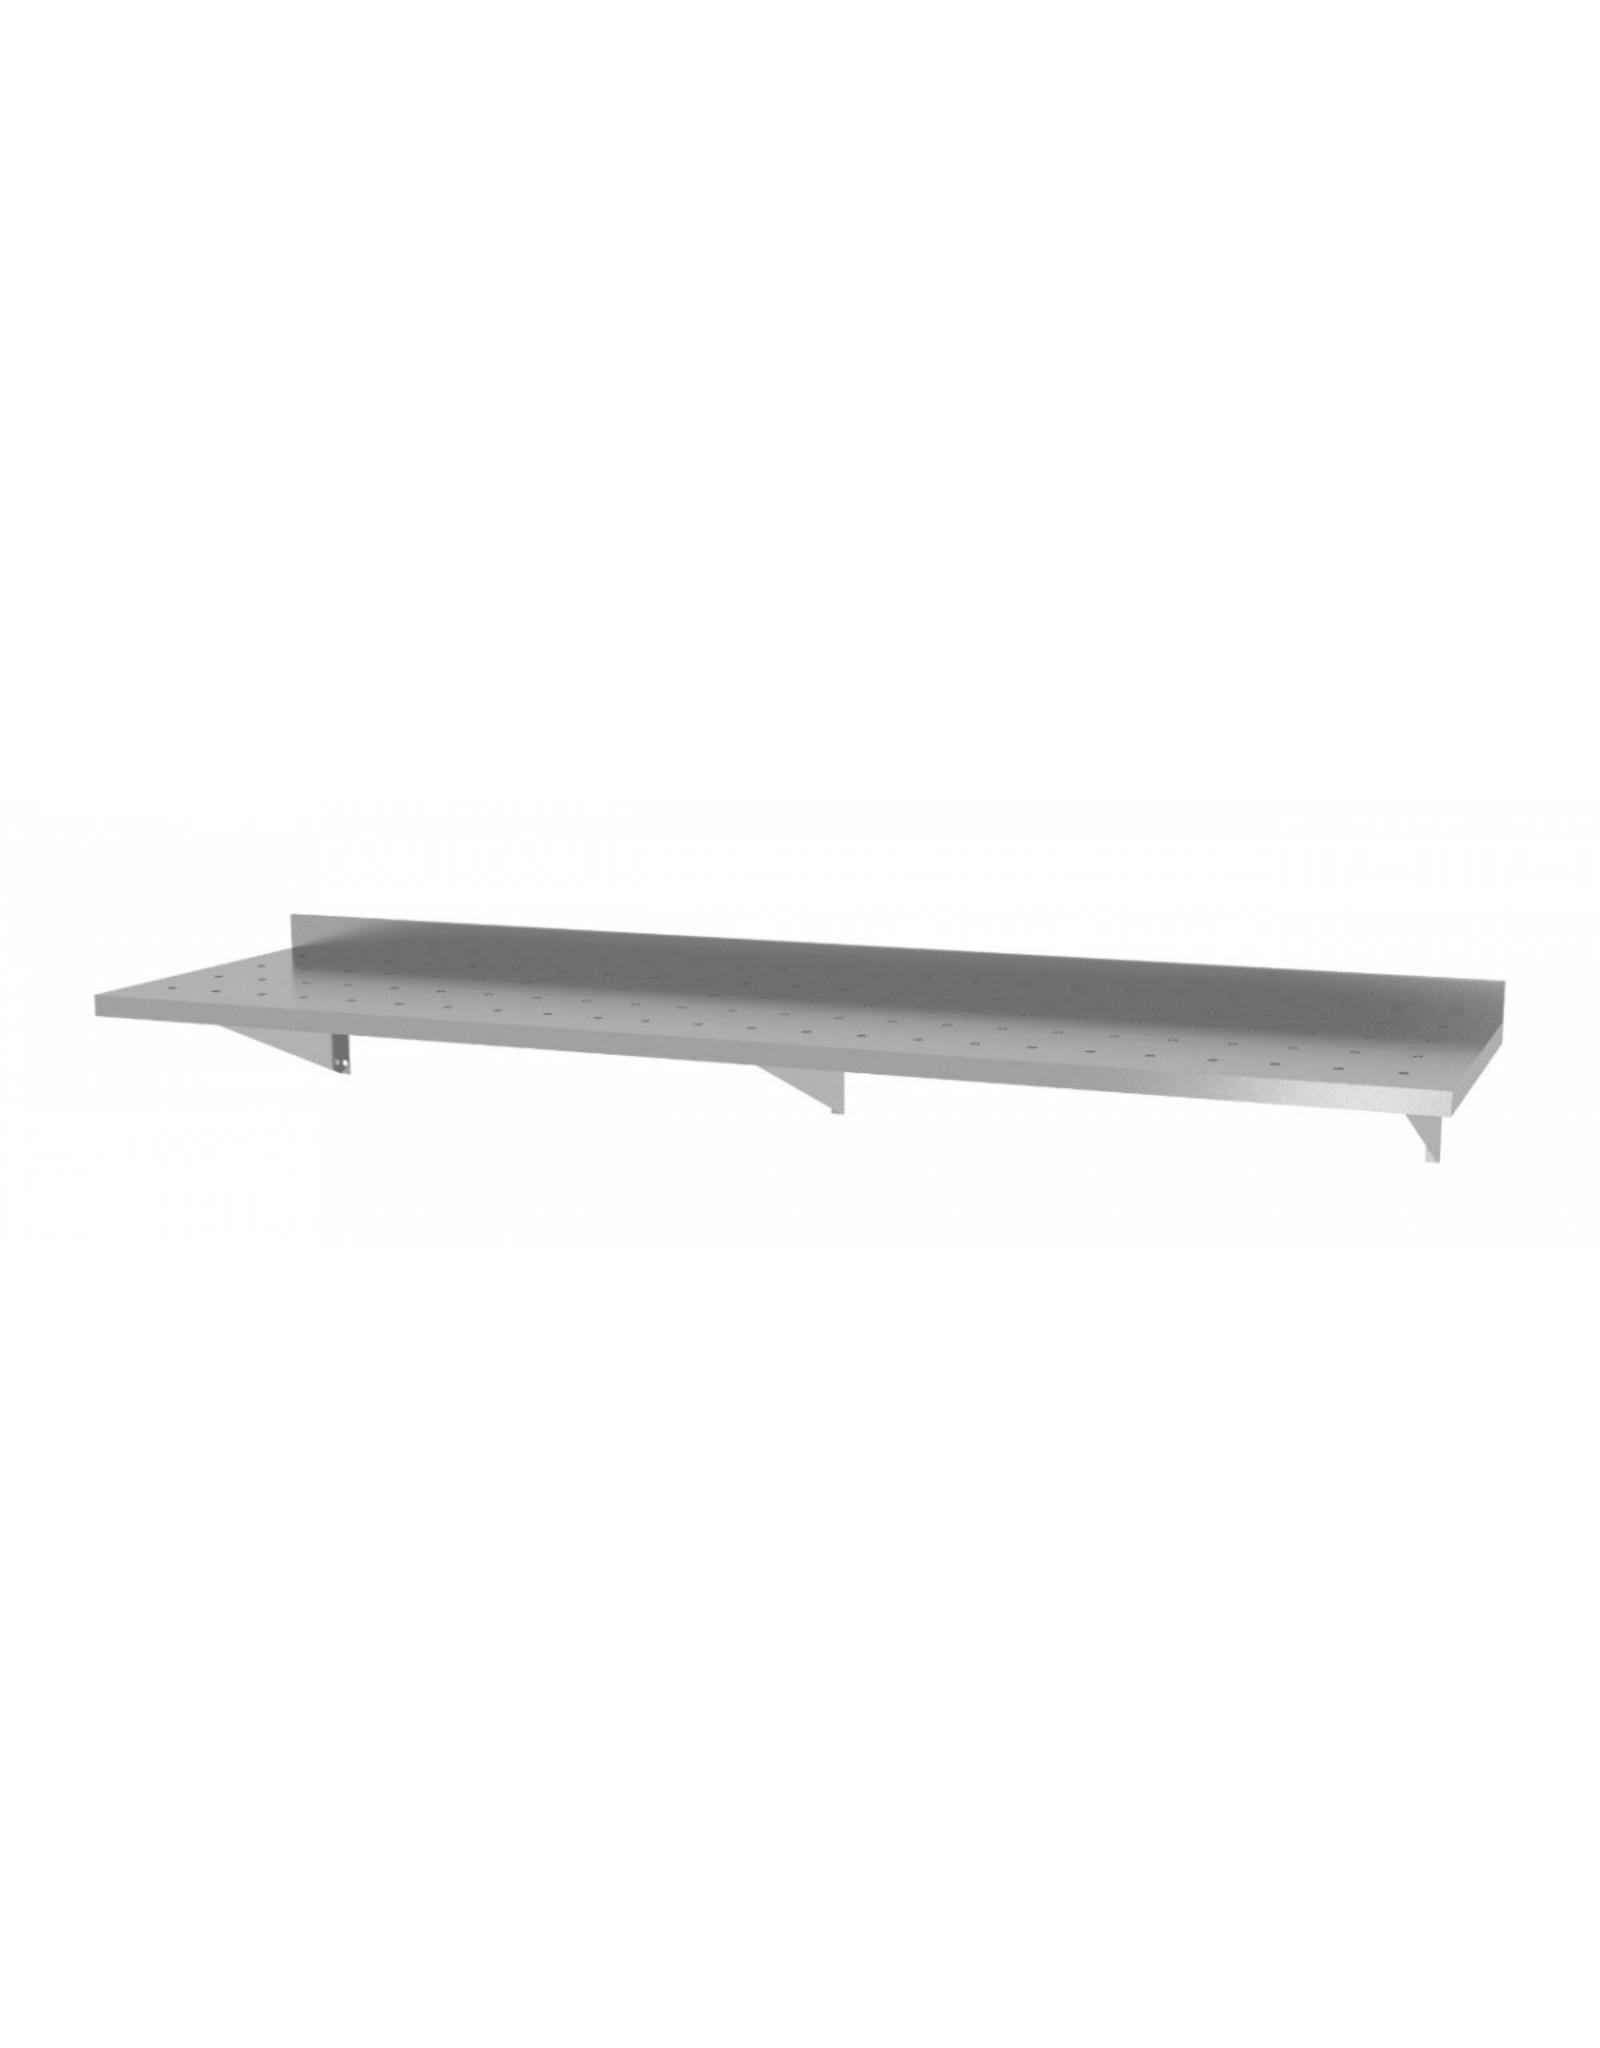 Wandplank geperforeerd vast model | met 3 beugels | 1600-2000mm breed | 300 of 400mm diep